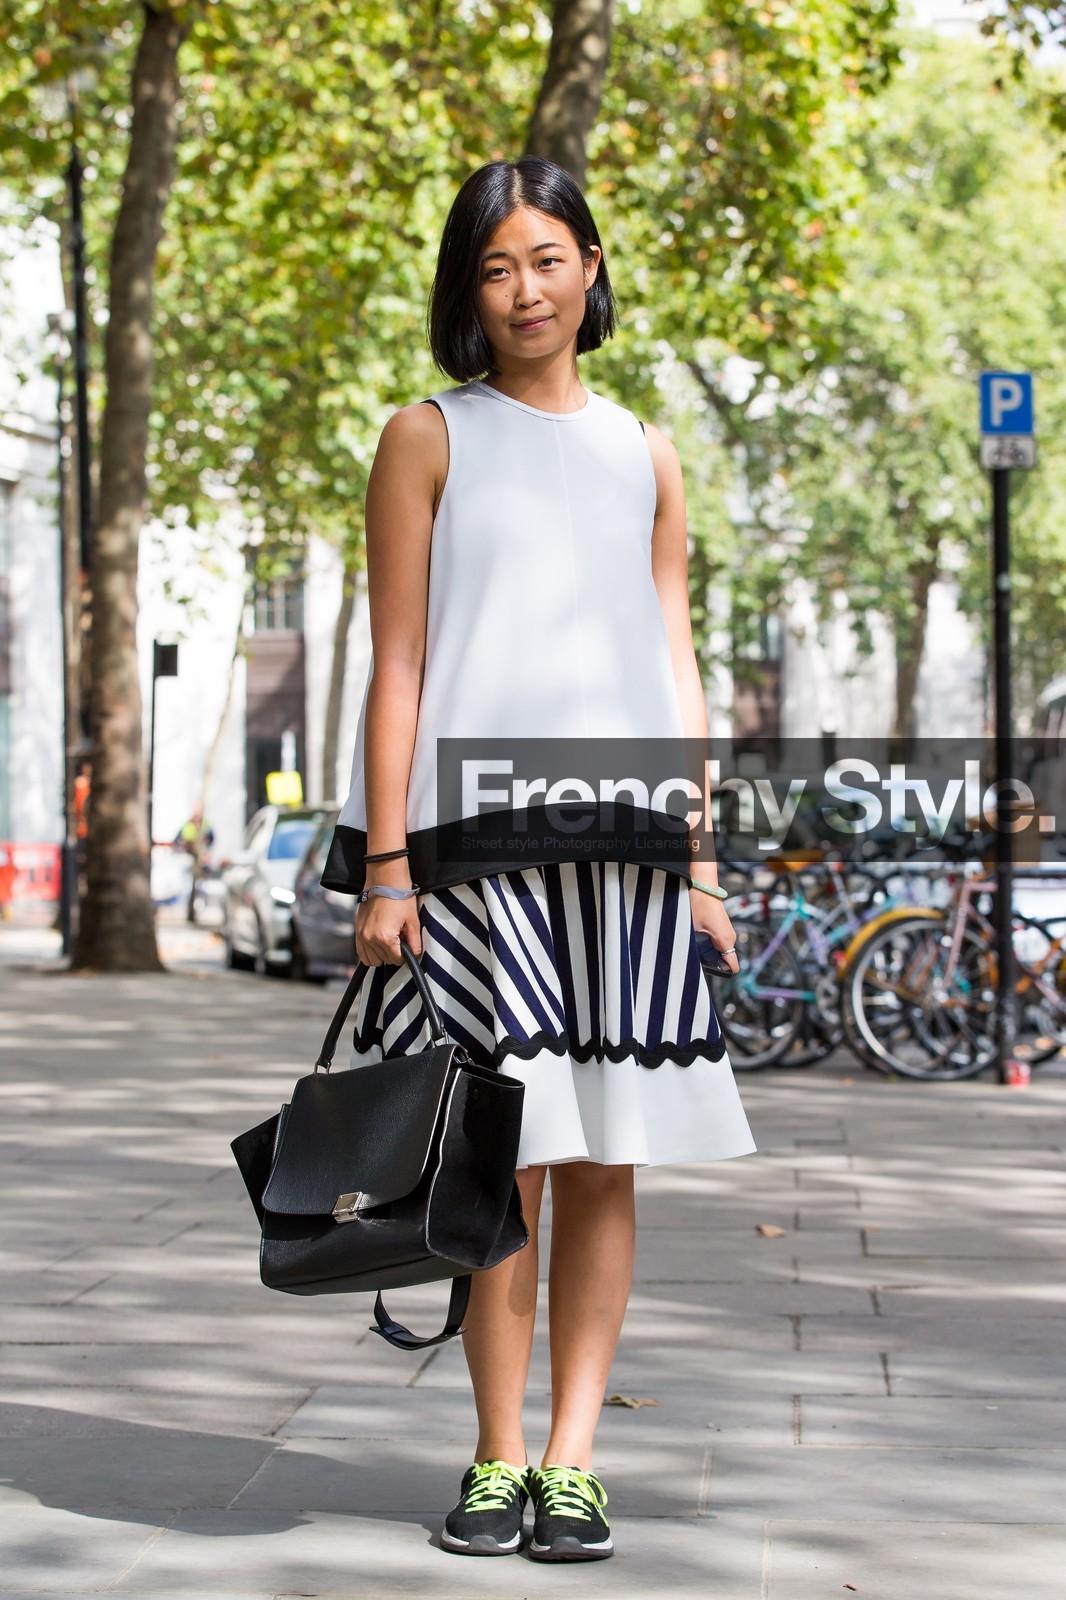 PHOTOS] Street Style Summer 2015: Monochrome Sneakers